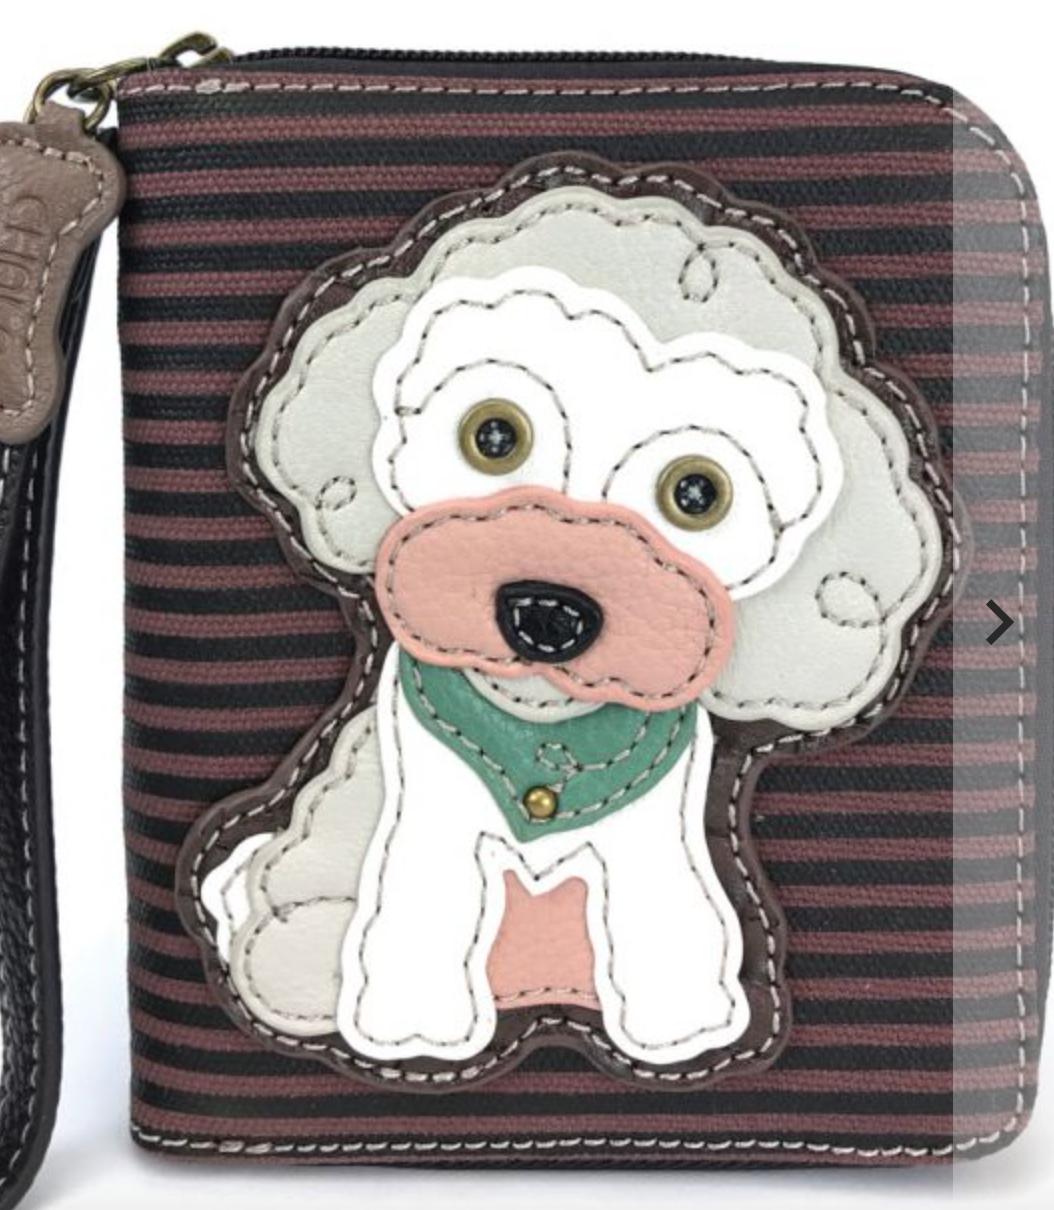 Poodle Striped Zip Around Wallet